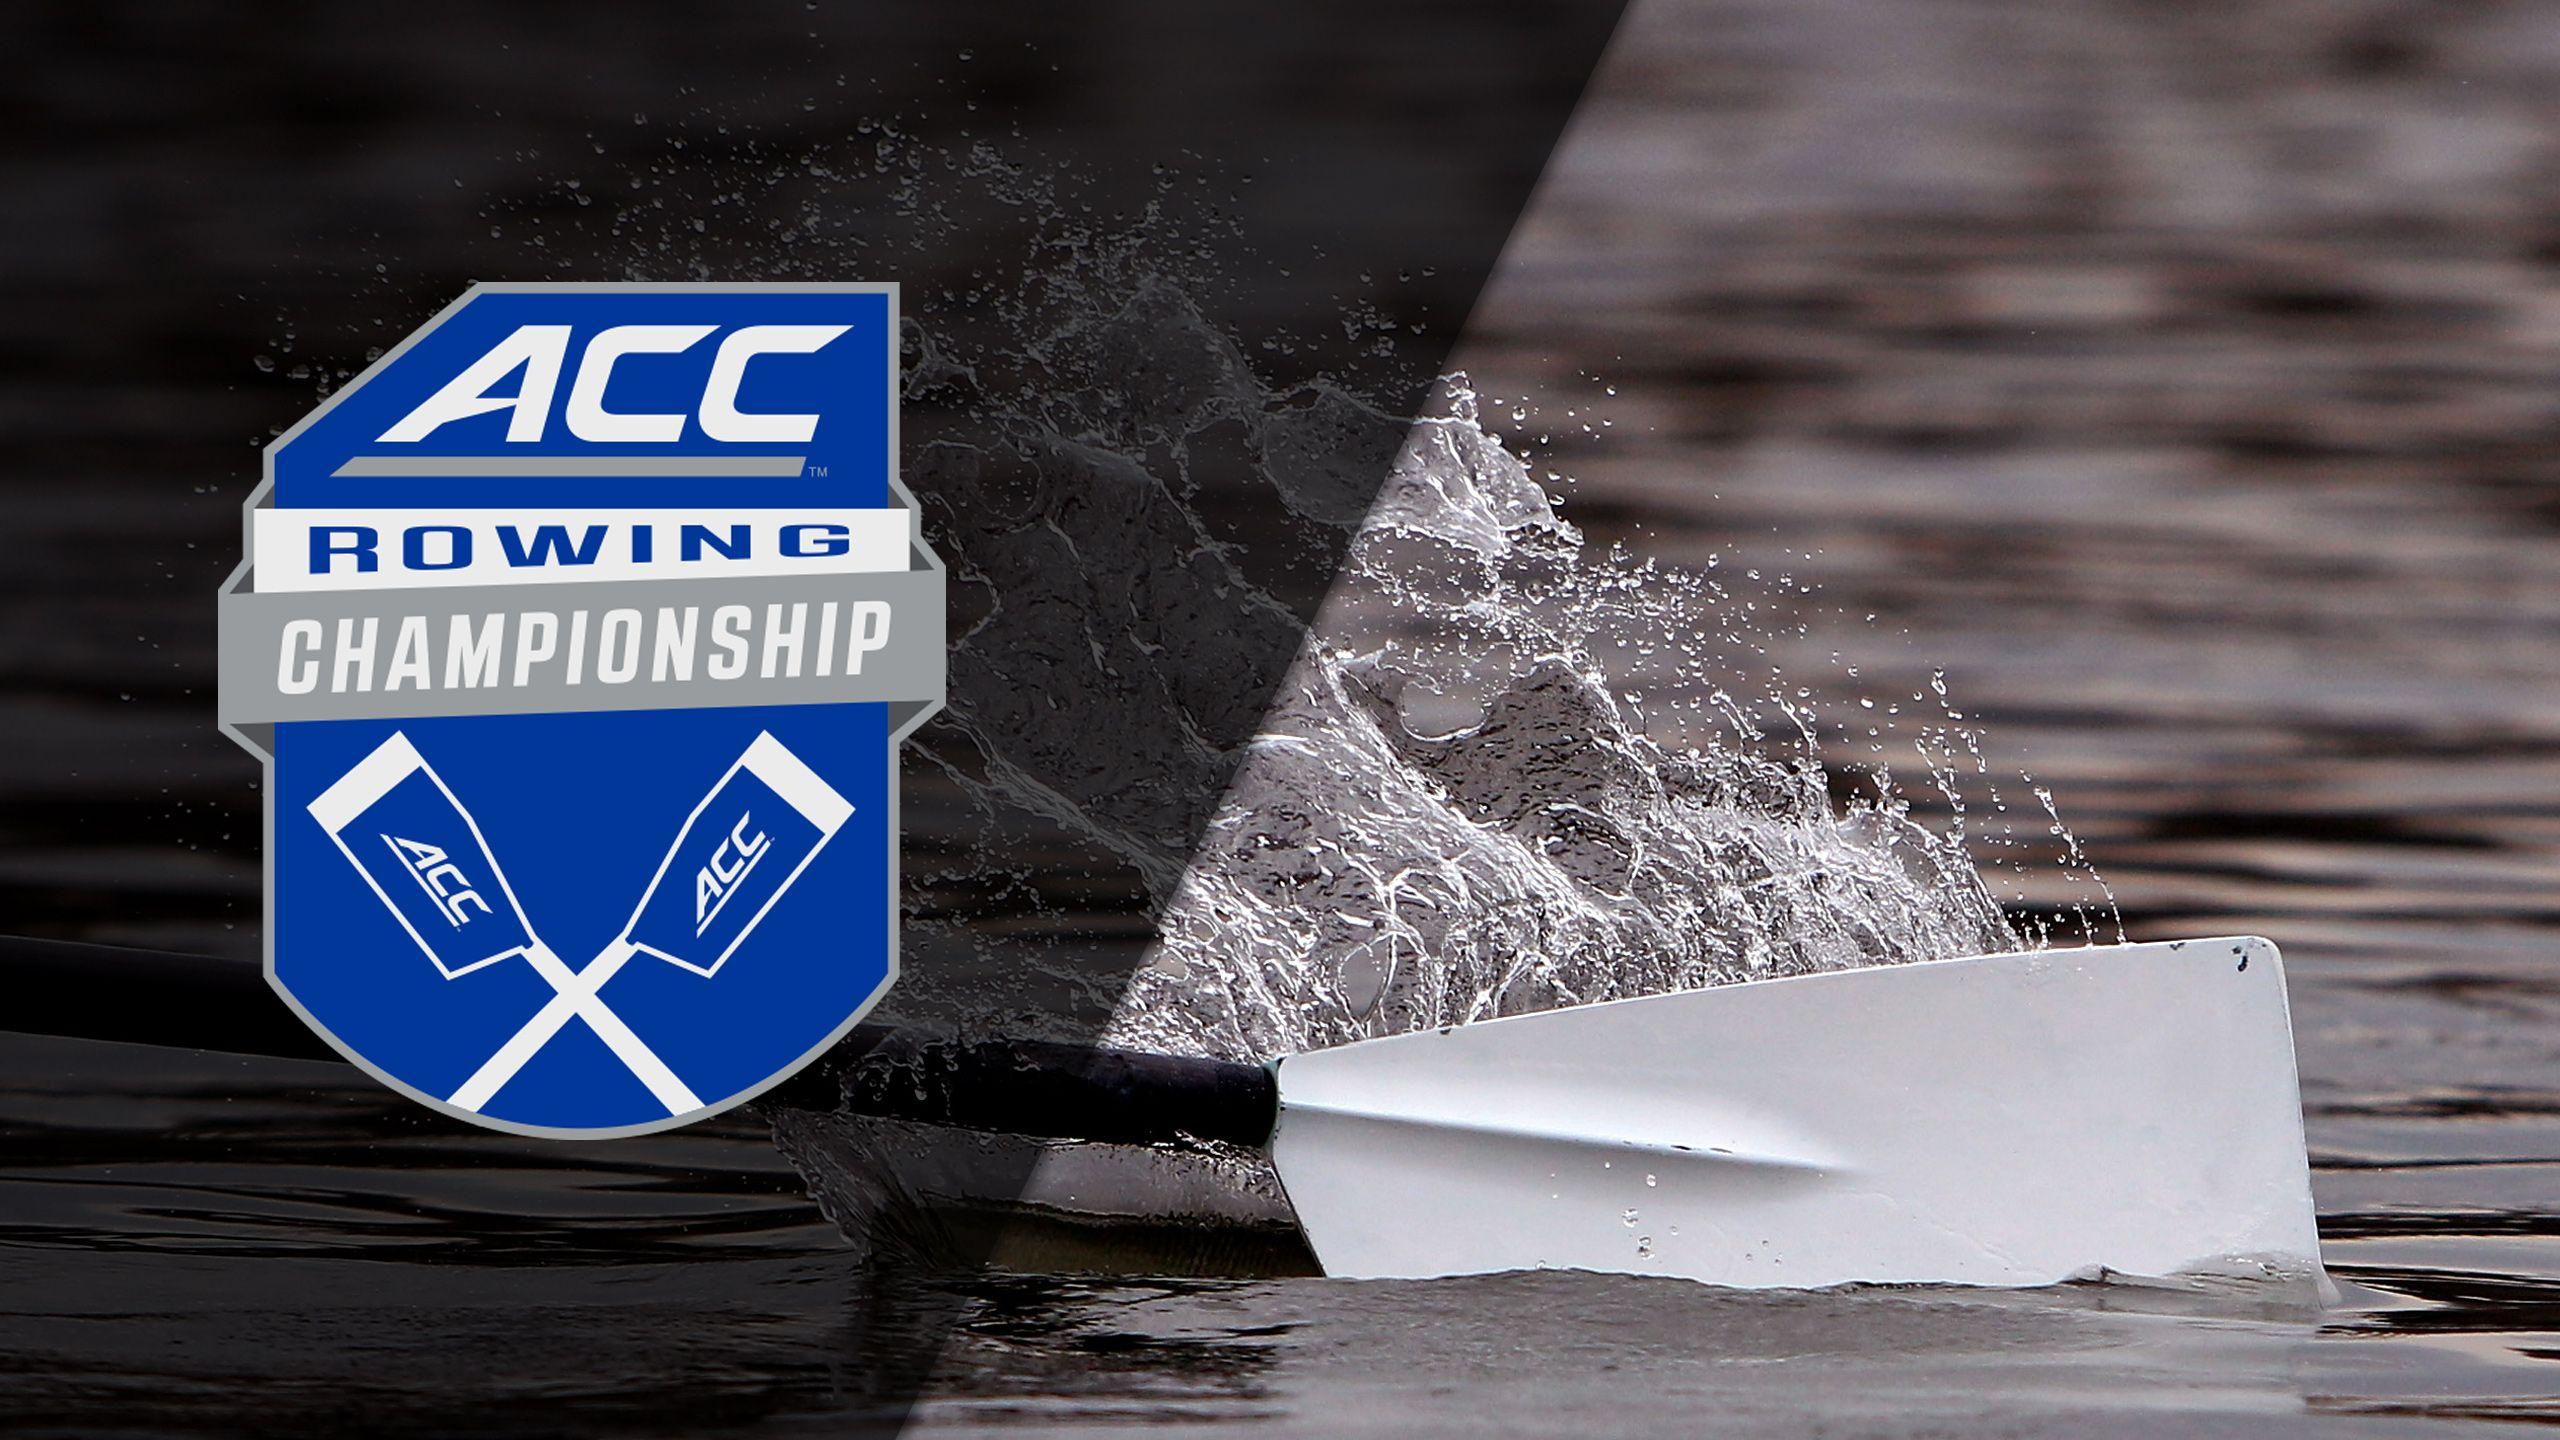 ACC Rowing Championship (Preliminaries)